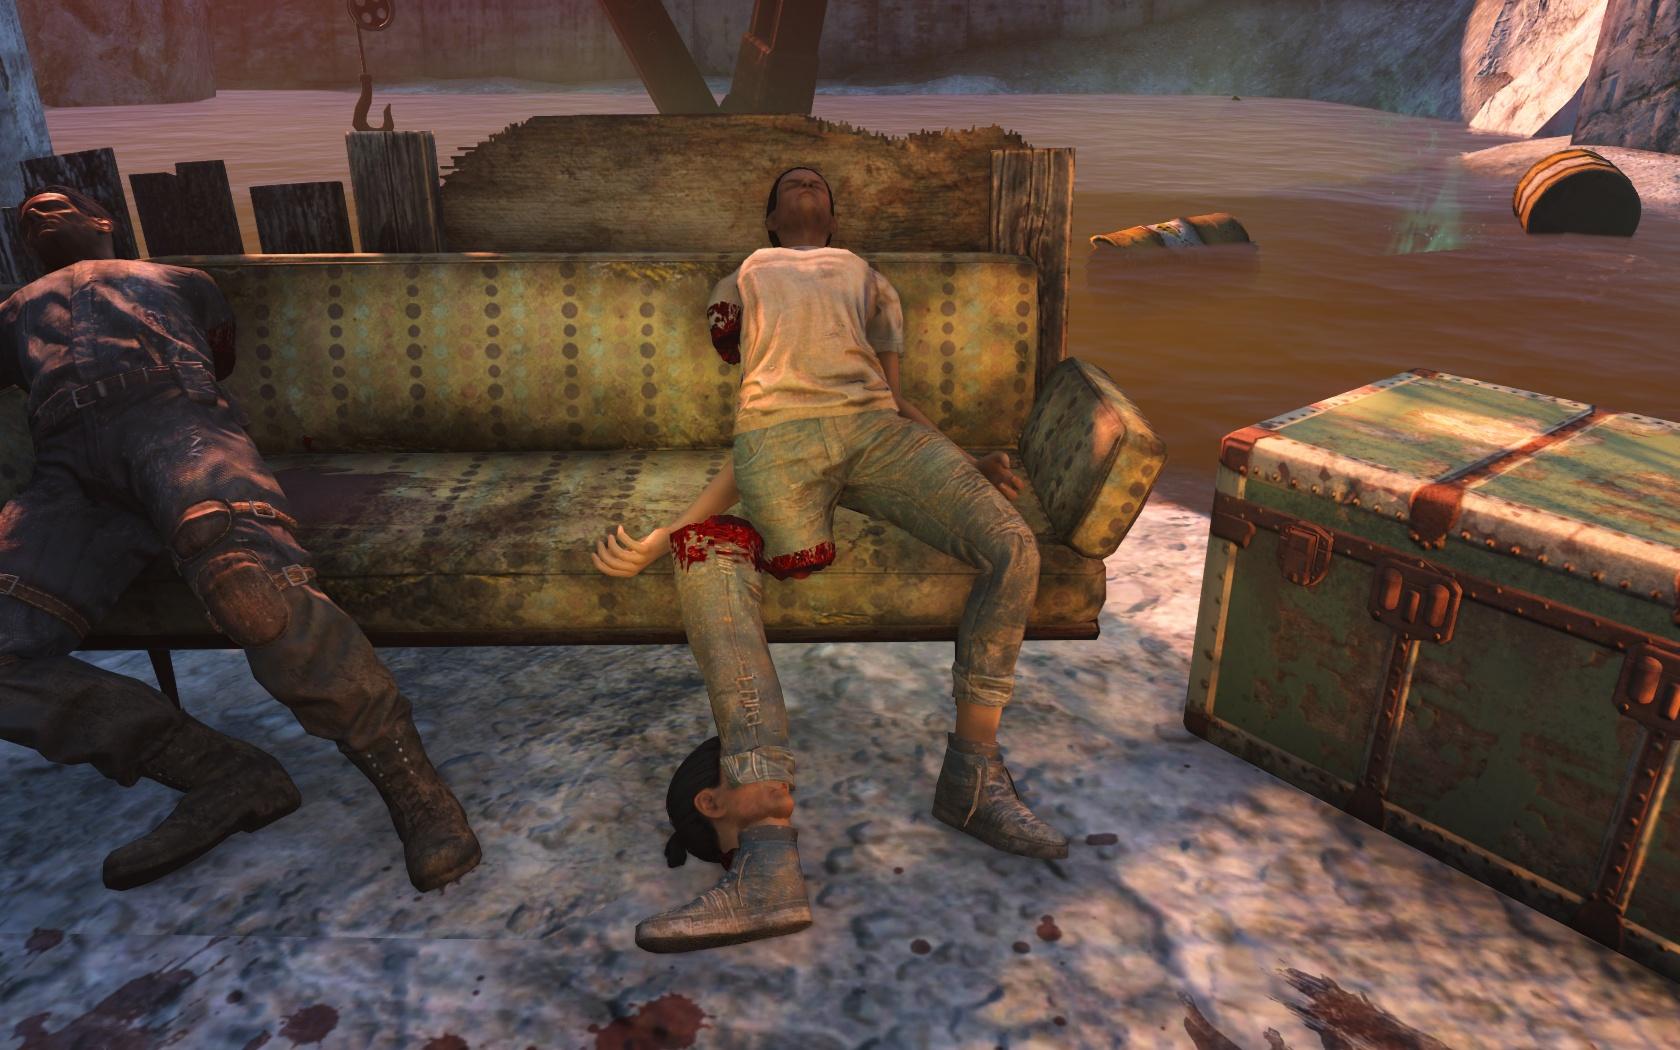 Головоногая (у входа в убежище 88) - Fallout 4 Баг, убежище, Убежище 88